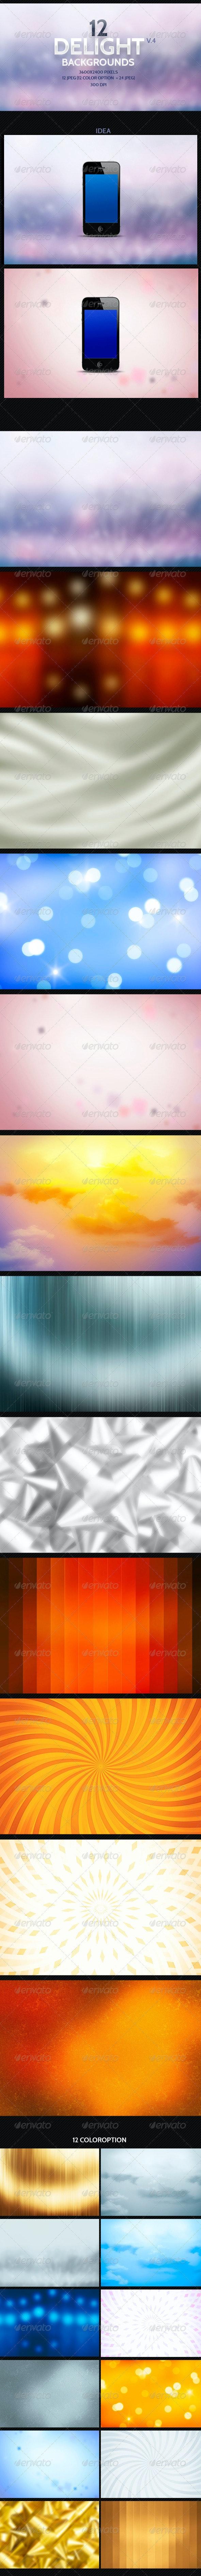 Delight Backgrounds v4 - Backgrounds Graphics